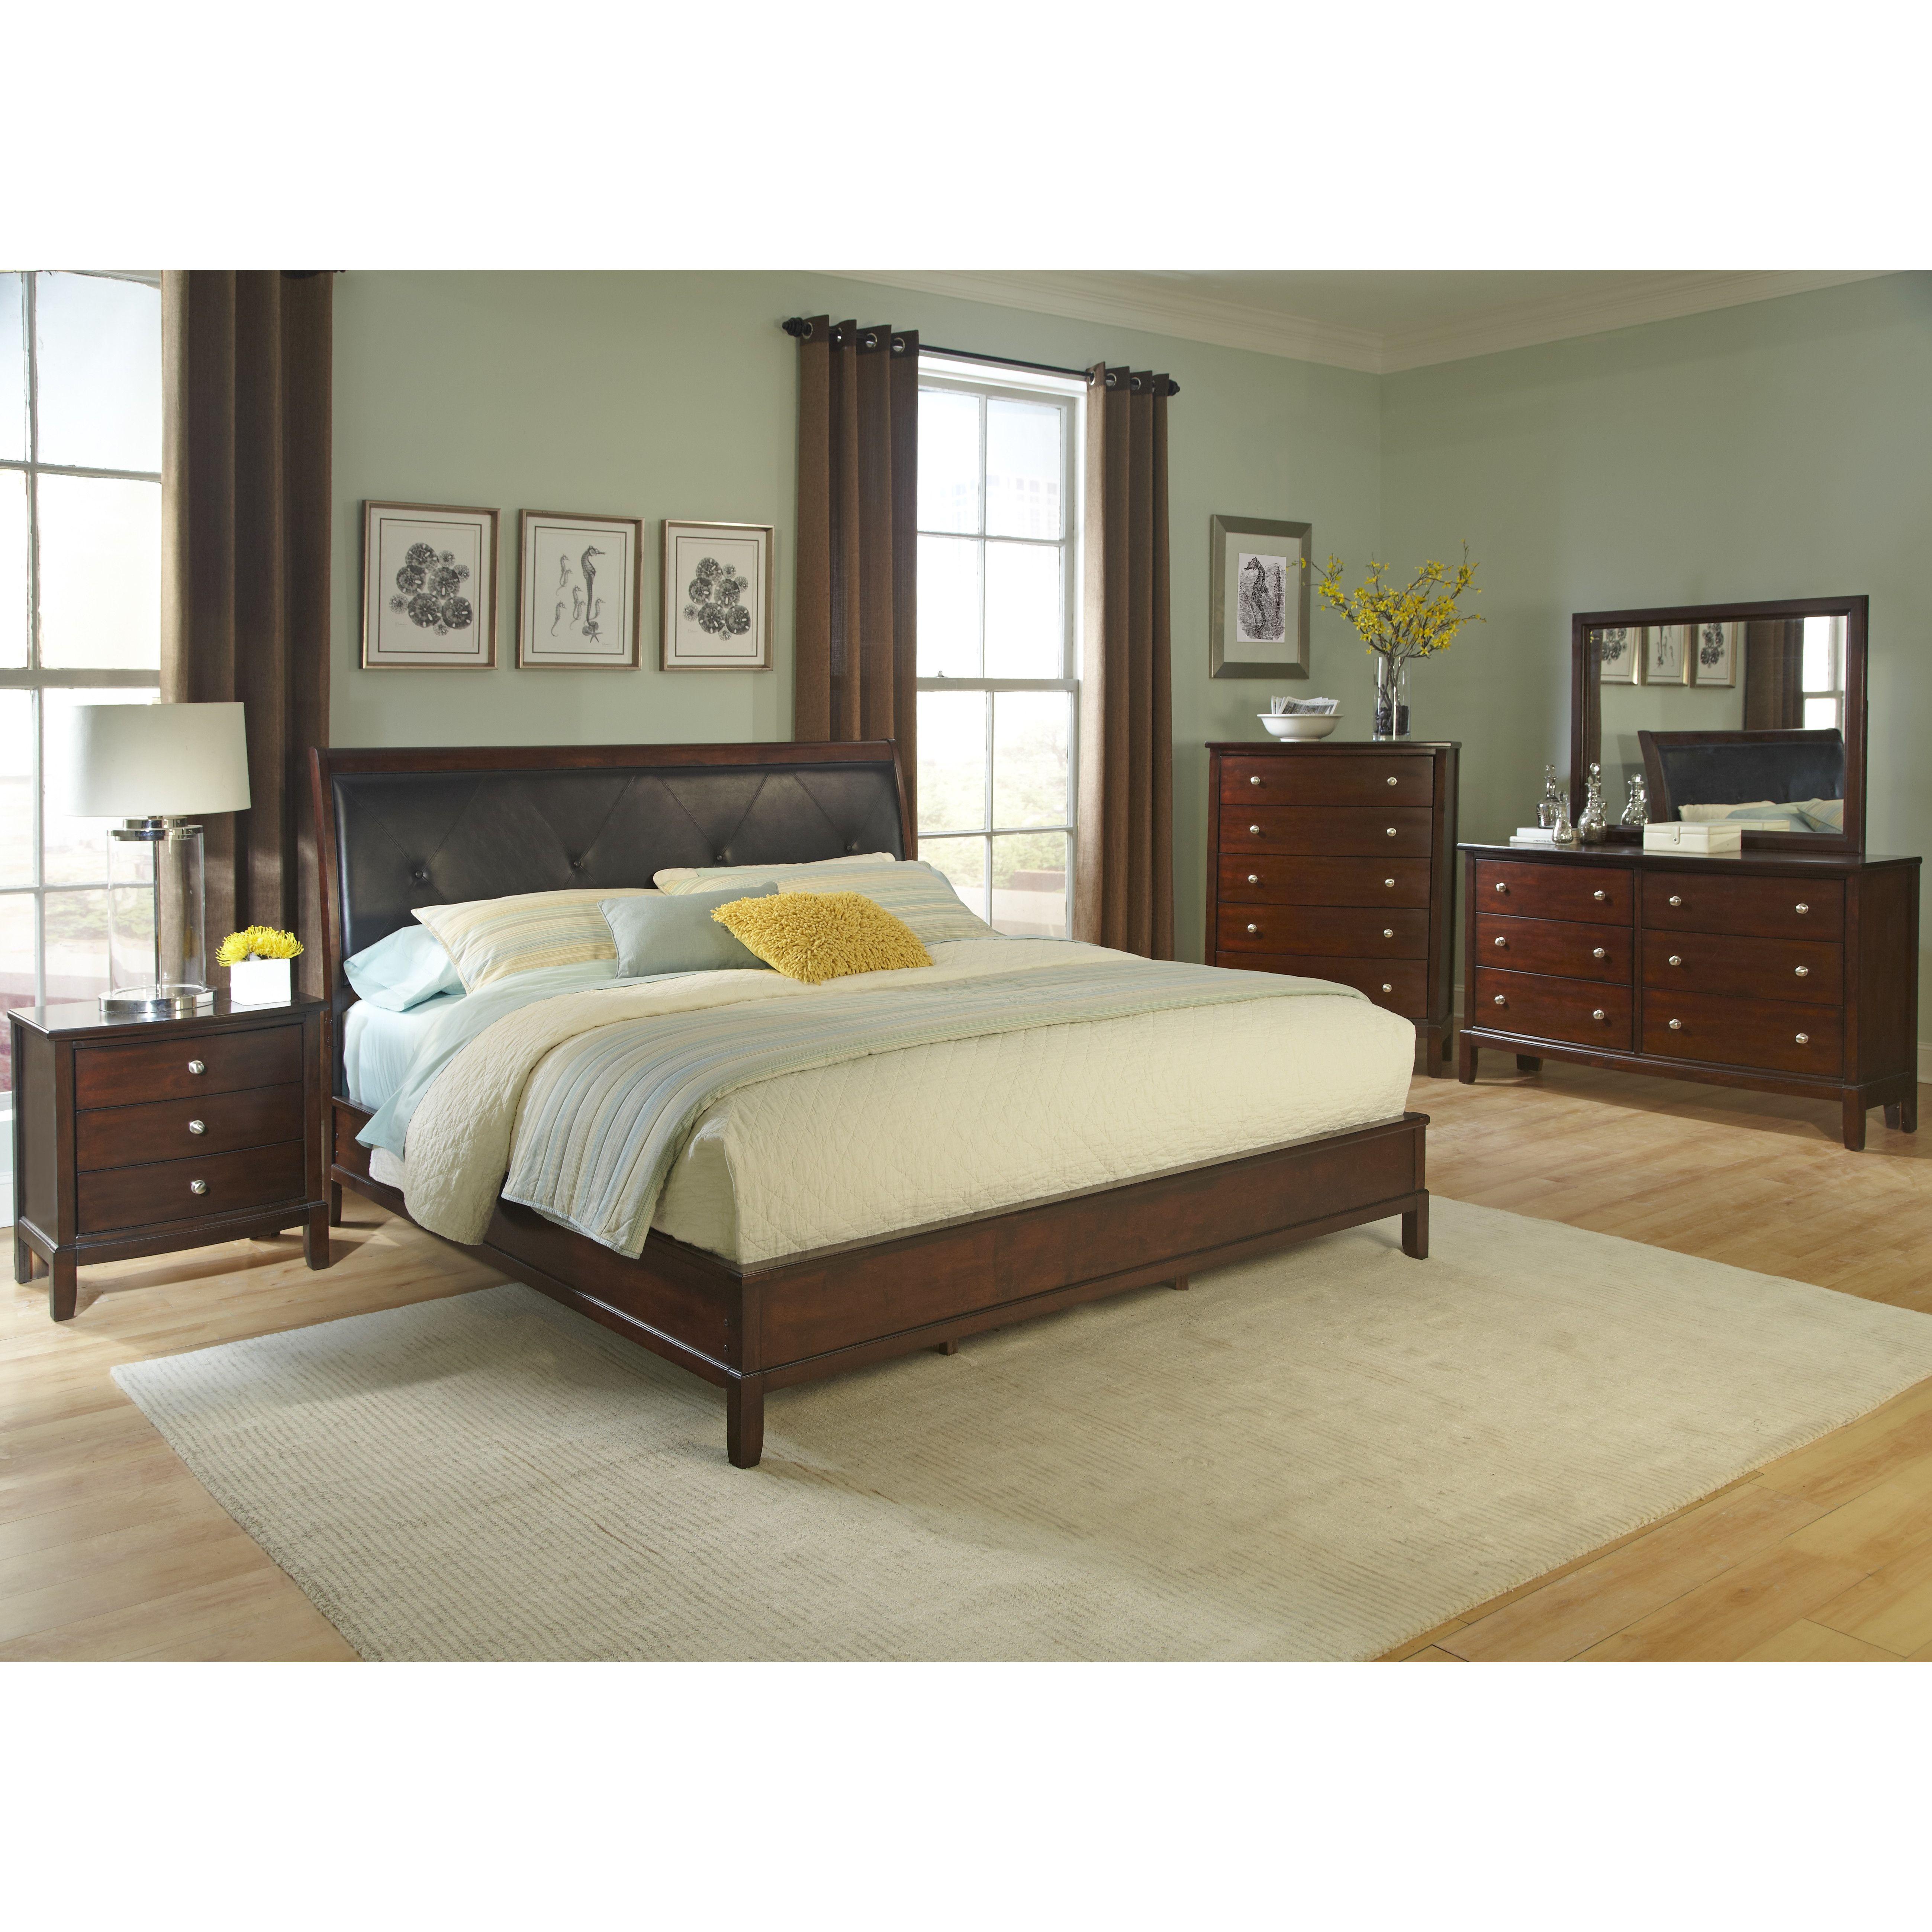 cheap bedroom furniture sets under design ideas